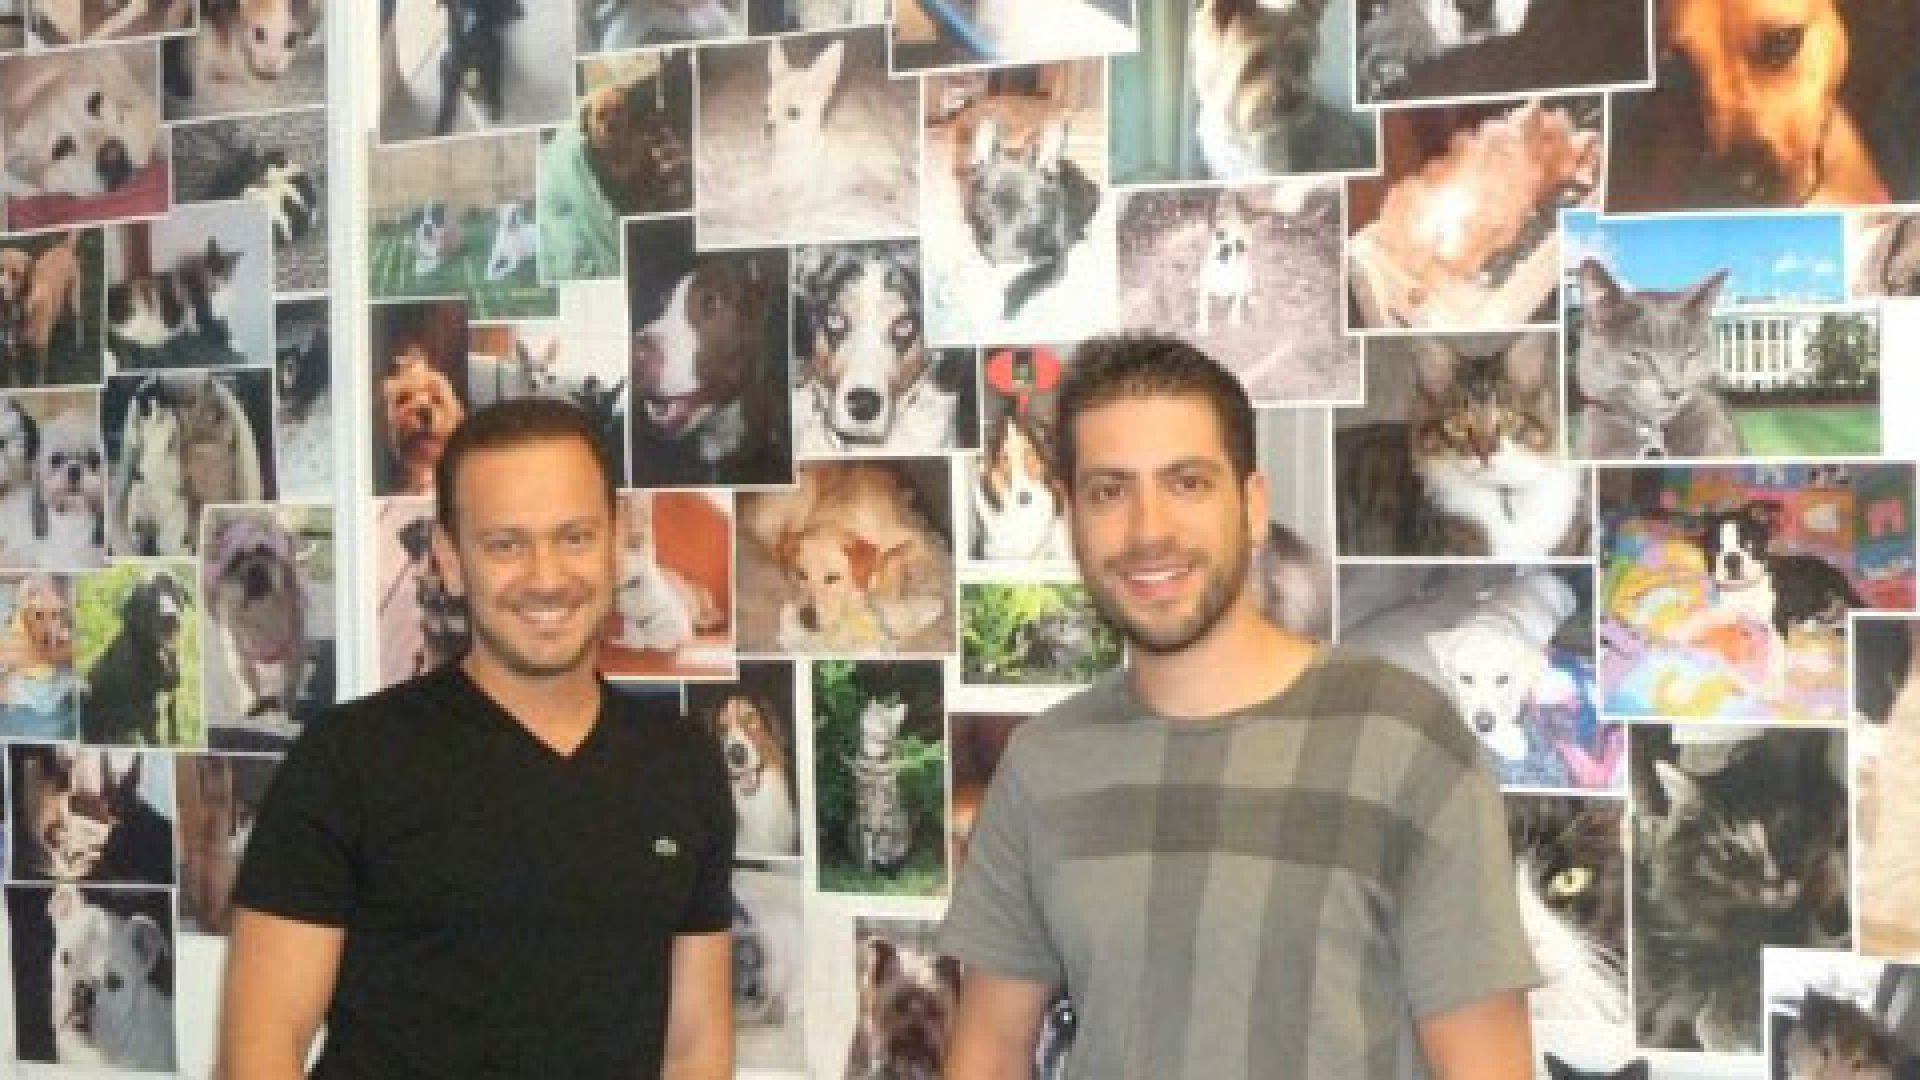 PetFlow founders Alex Zhardanvosky and Joe Speiser